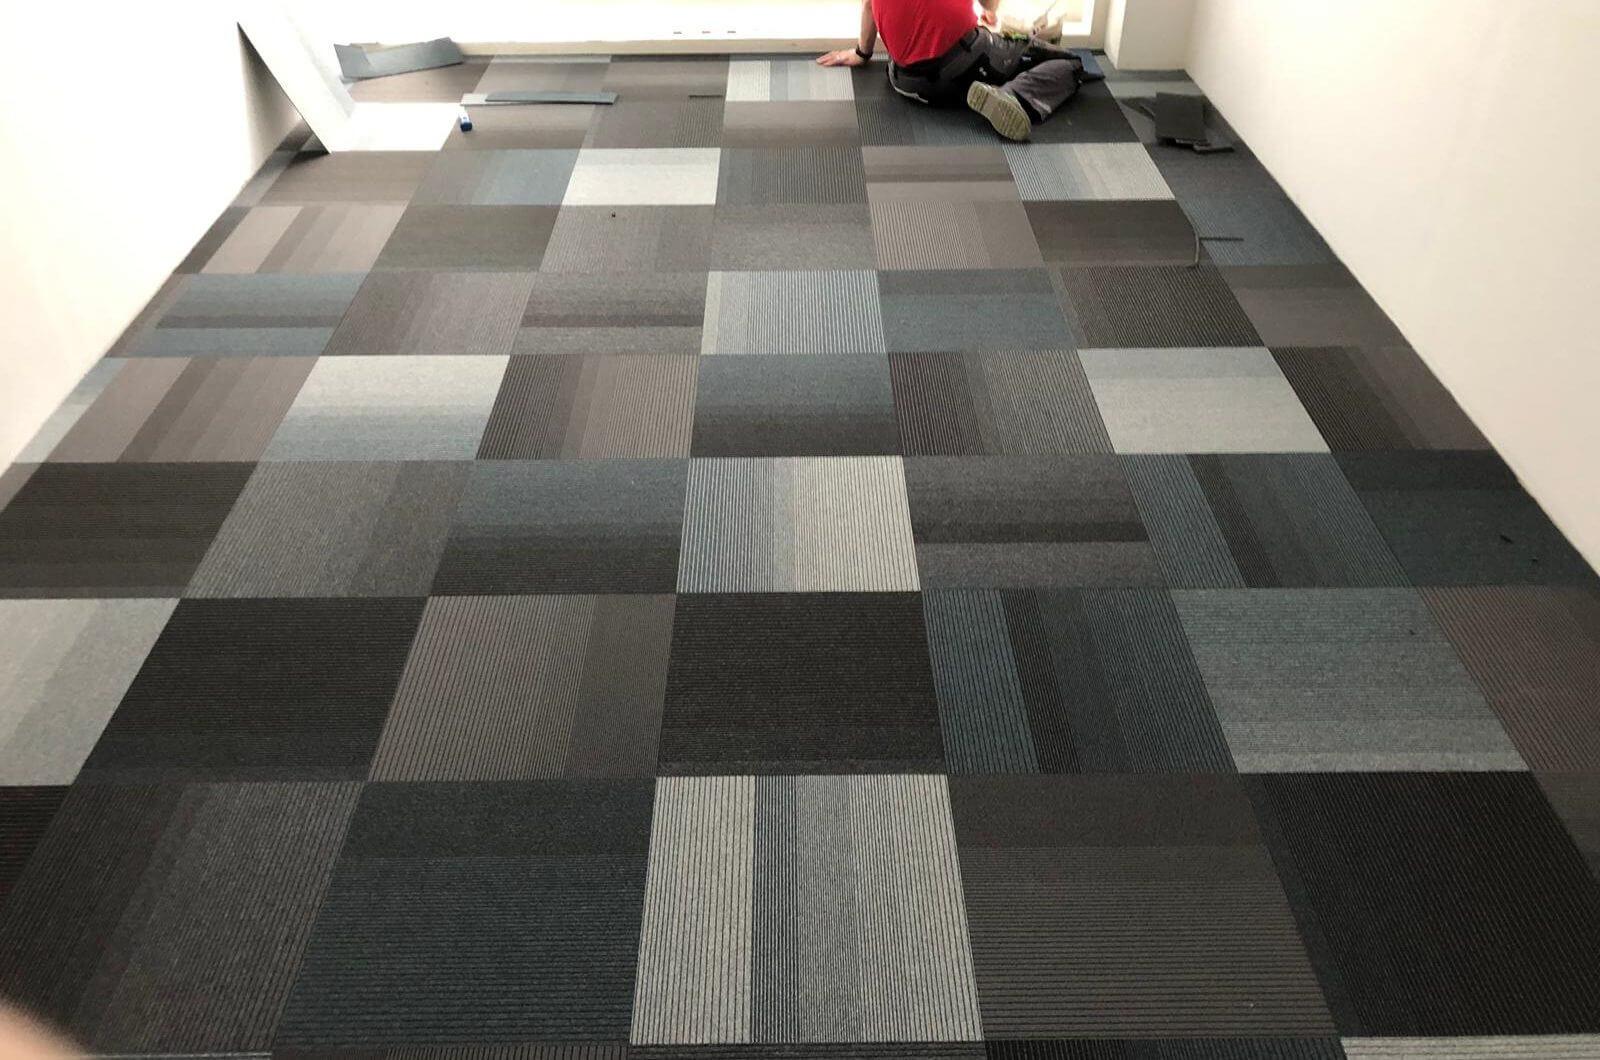 malerbetrieb-ulrich-teppichboden